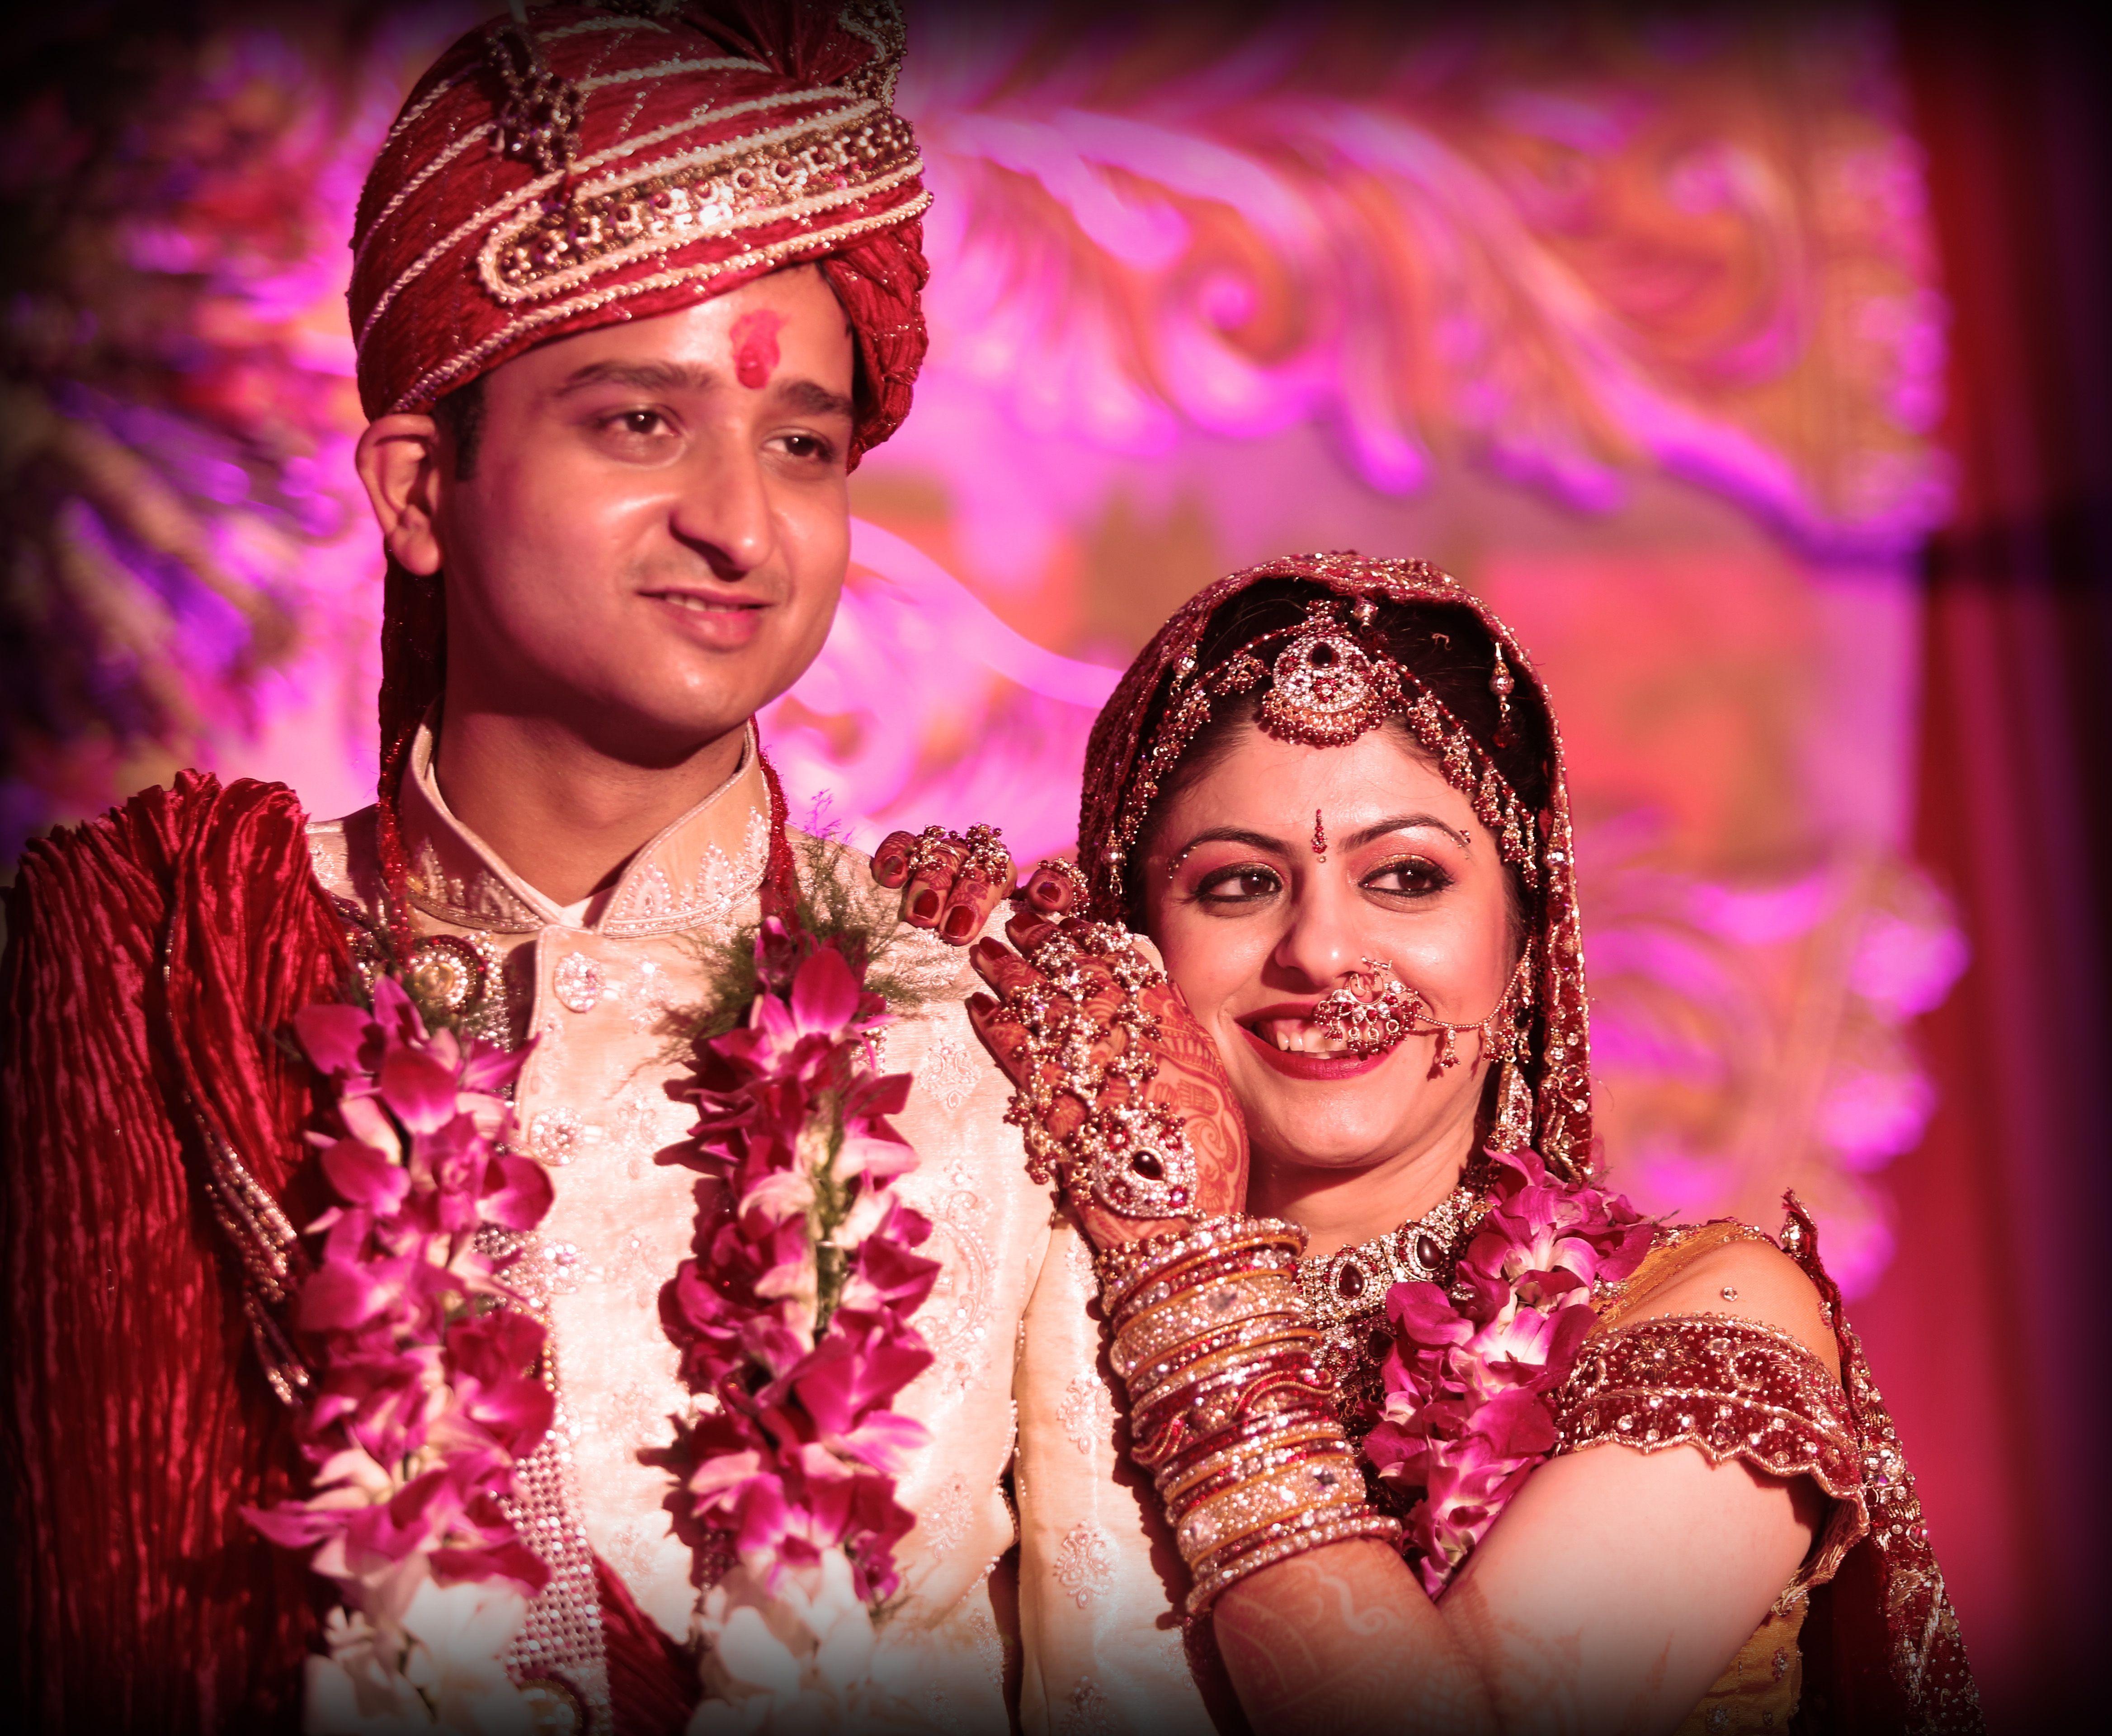 indian wedding photography design%0A Famous Wedding and Family Portrait Photography in India  http   delhi quikr com FamousWeddingandFamilyPortraitPhotographyin IndiaW QQAdIdZ   u